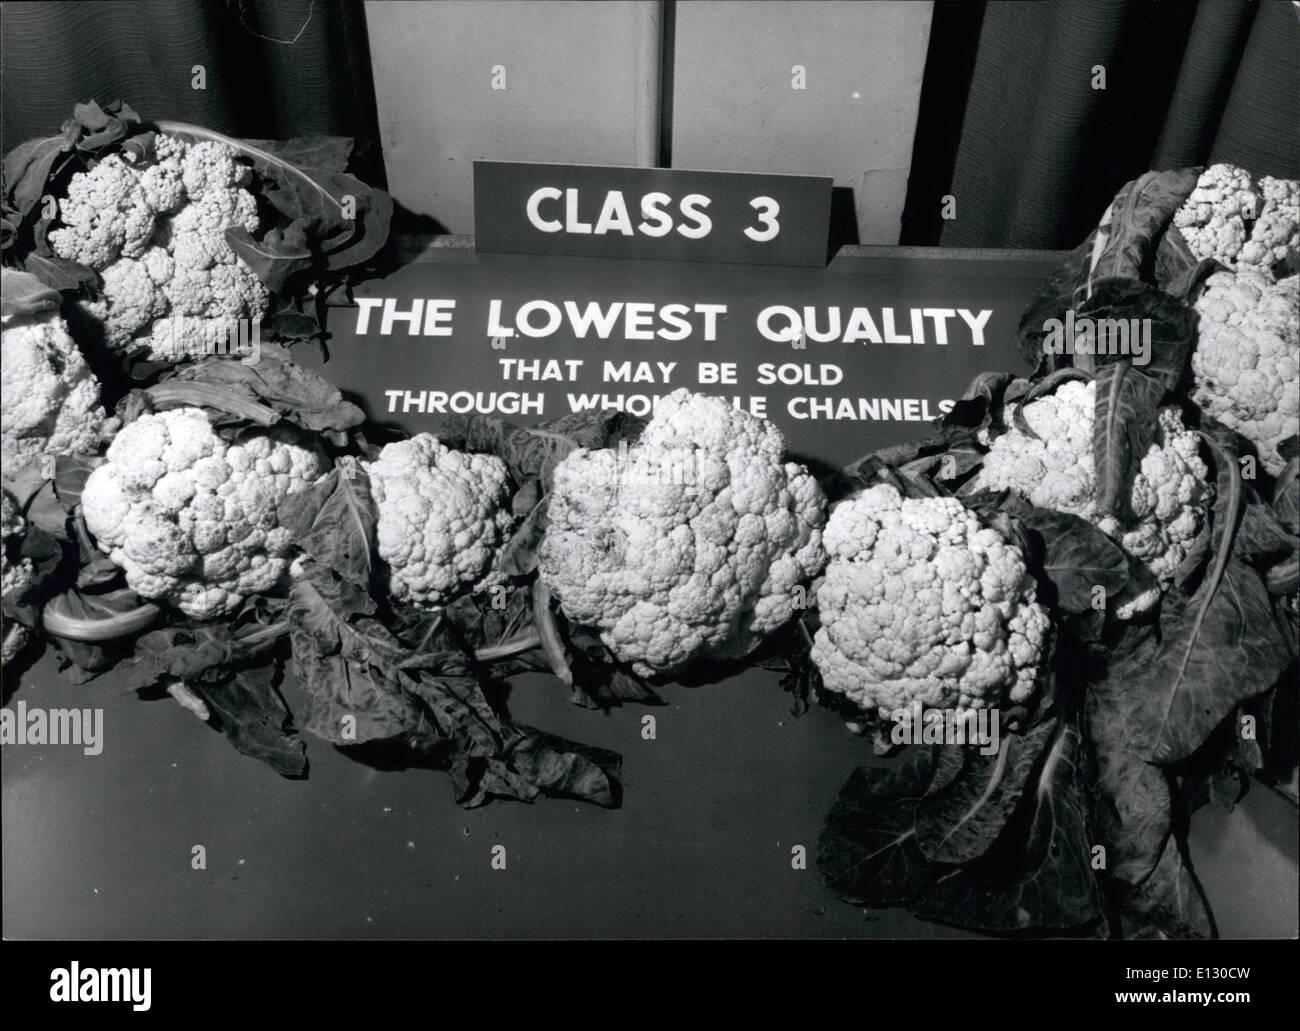 Feb. 26, 2012 - An instructor demonstrates cauliflower grades. - Stock Image